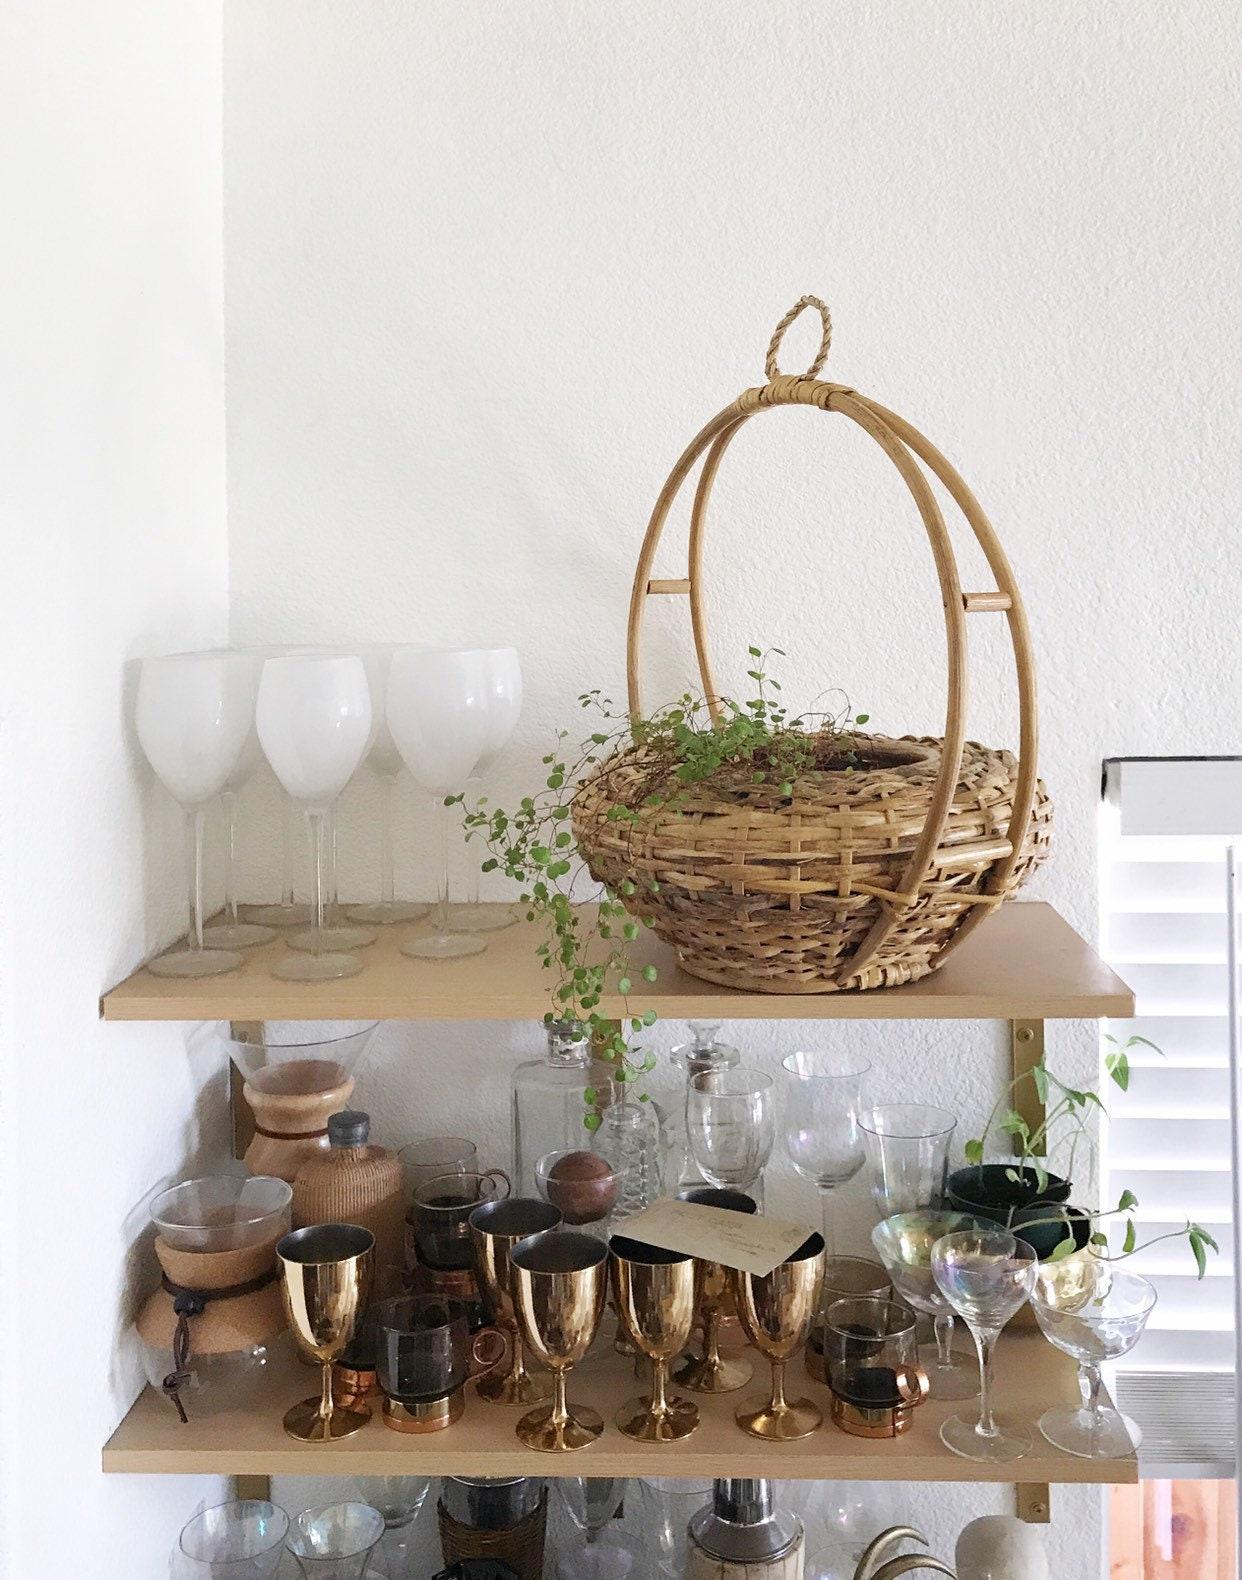 Large Vintage Woven Wicker Rattan Hanging Basket Planter